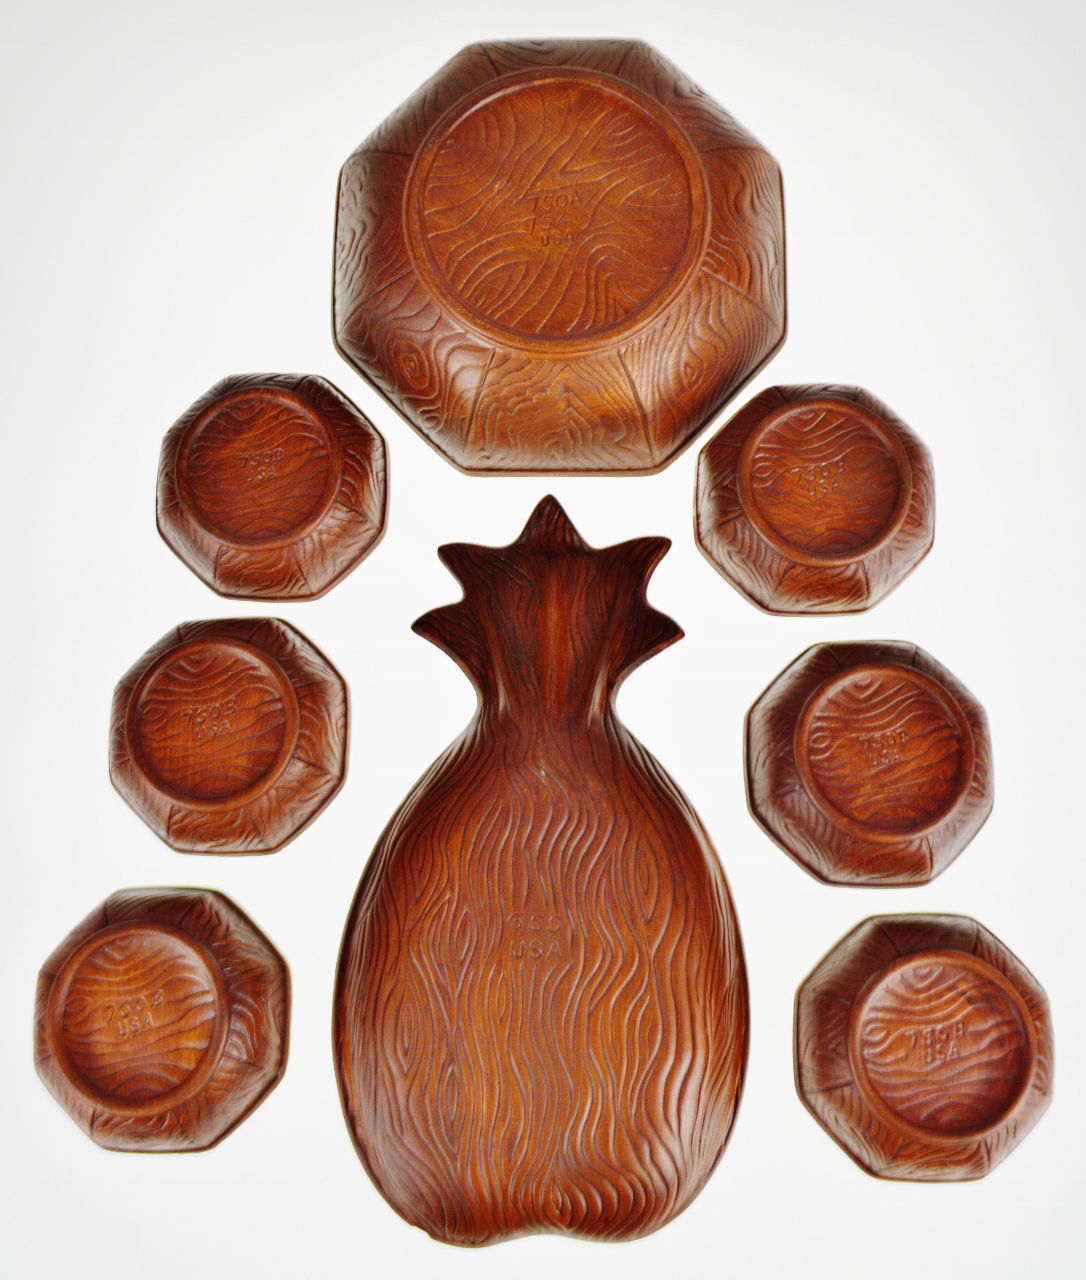 Group of 8 Vintage Sequoia Ceramic Salad Bowl Set /& Pineapple Tray